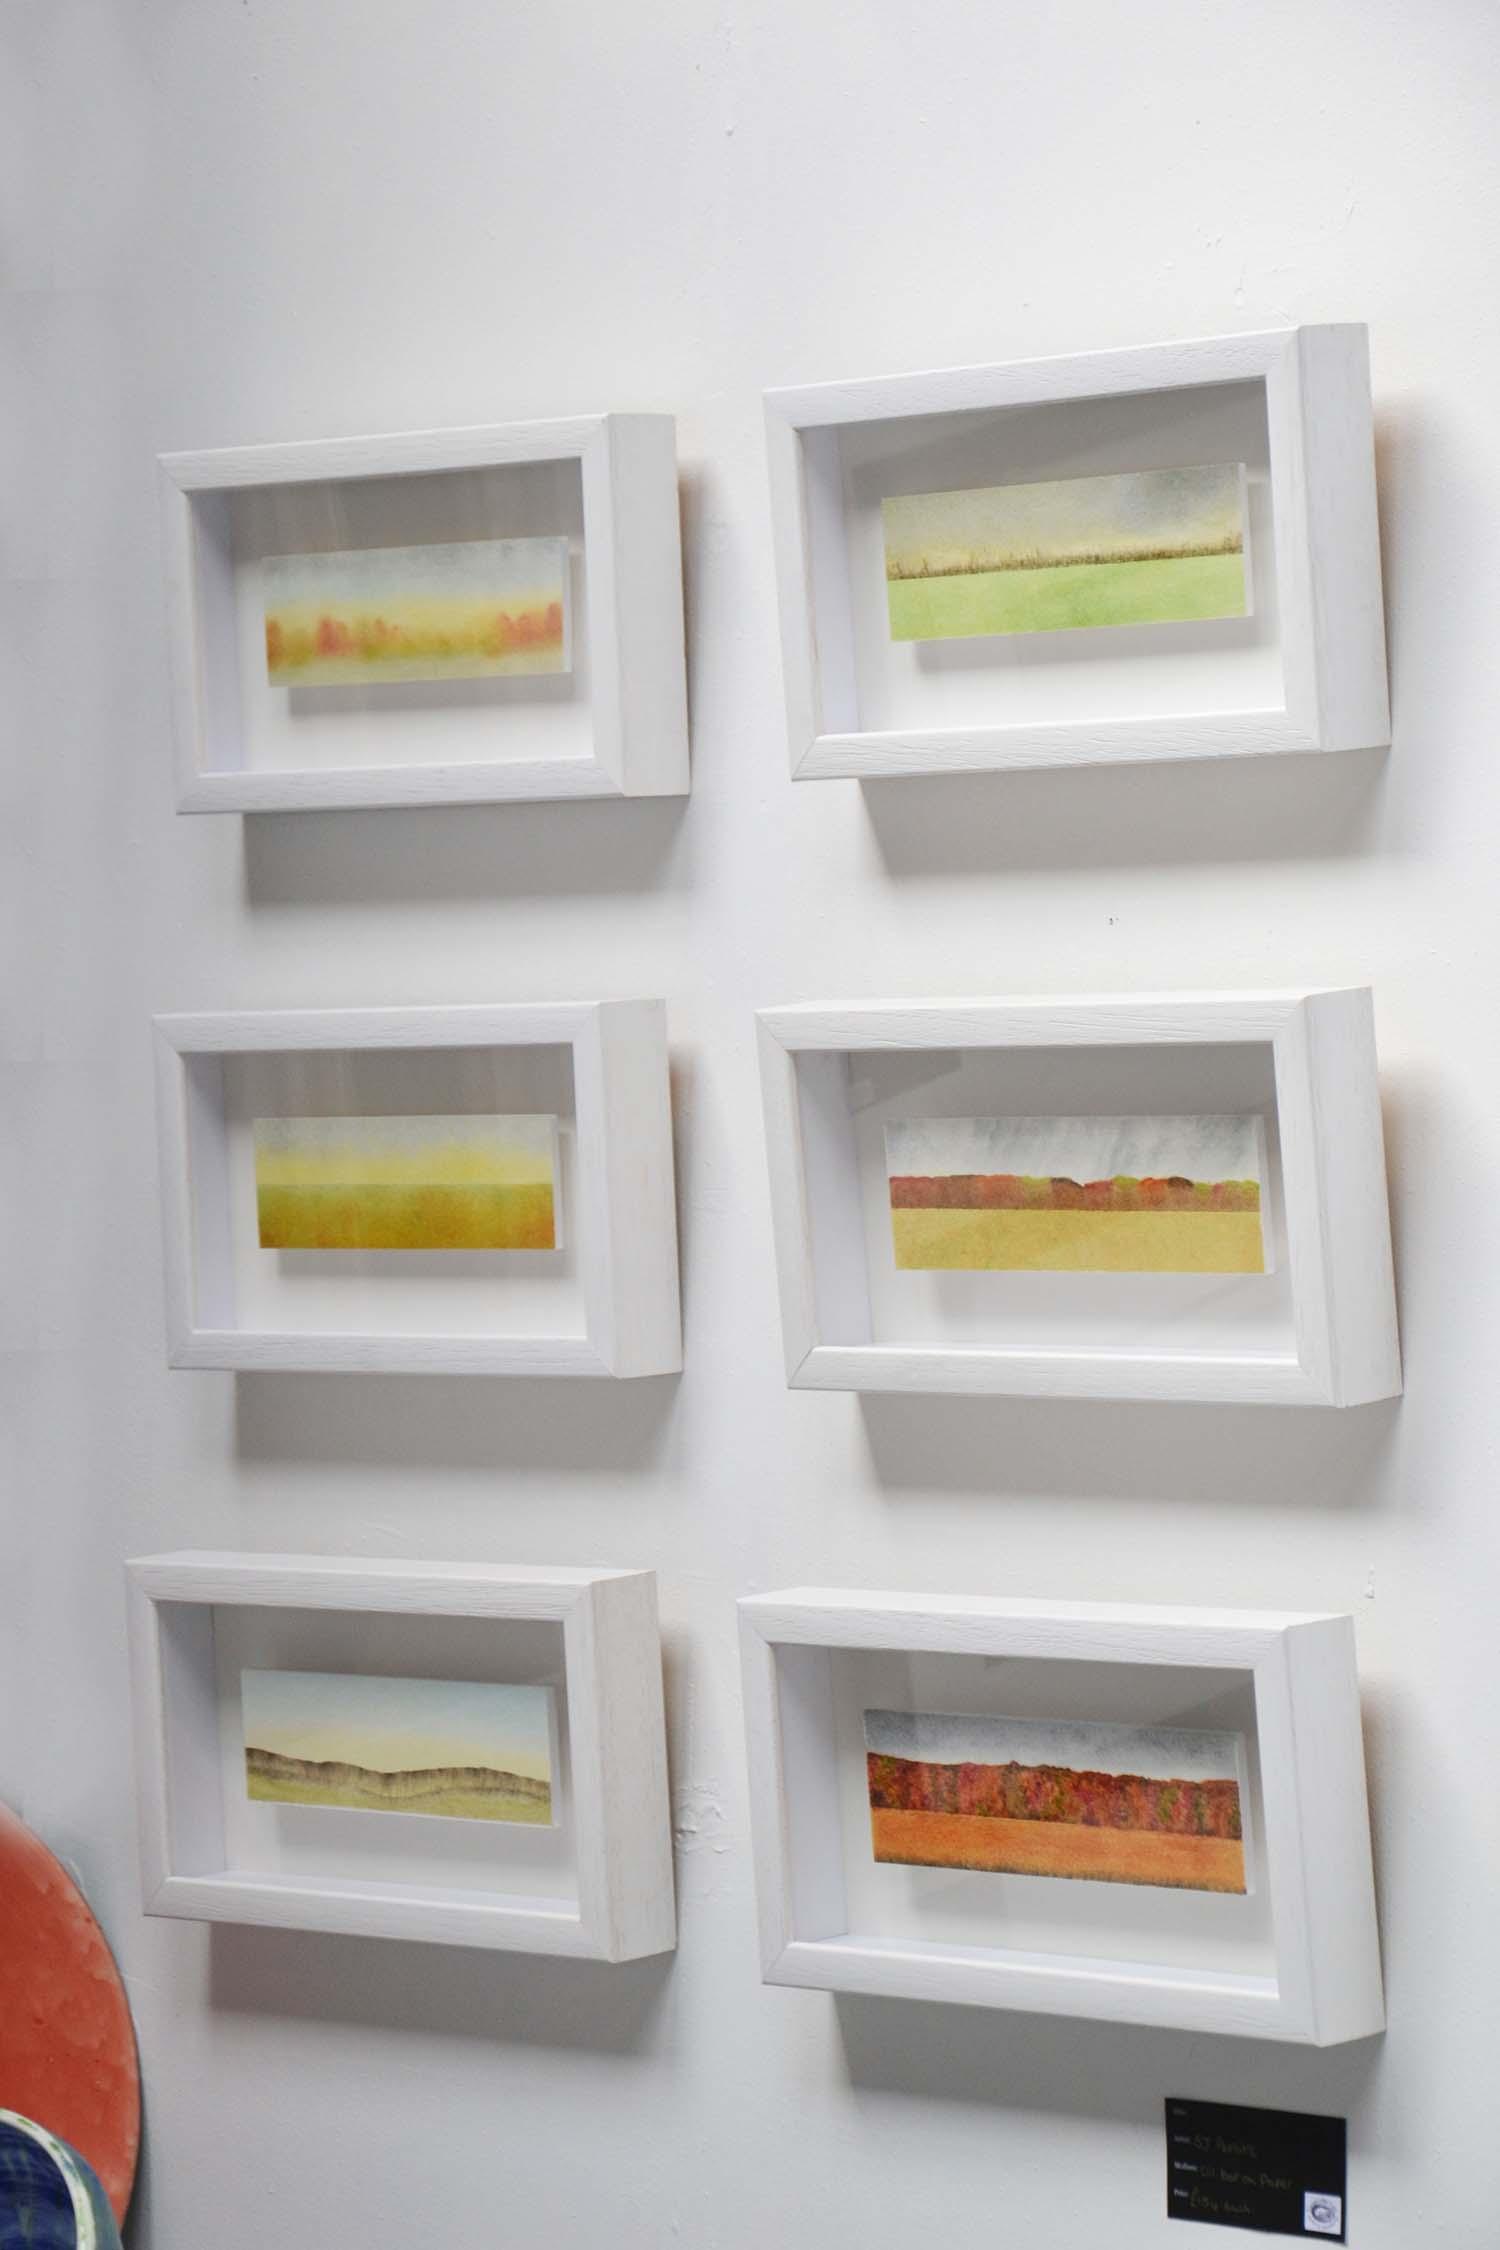 Exhibition-Image-9